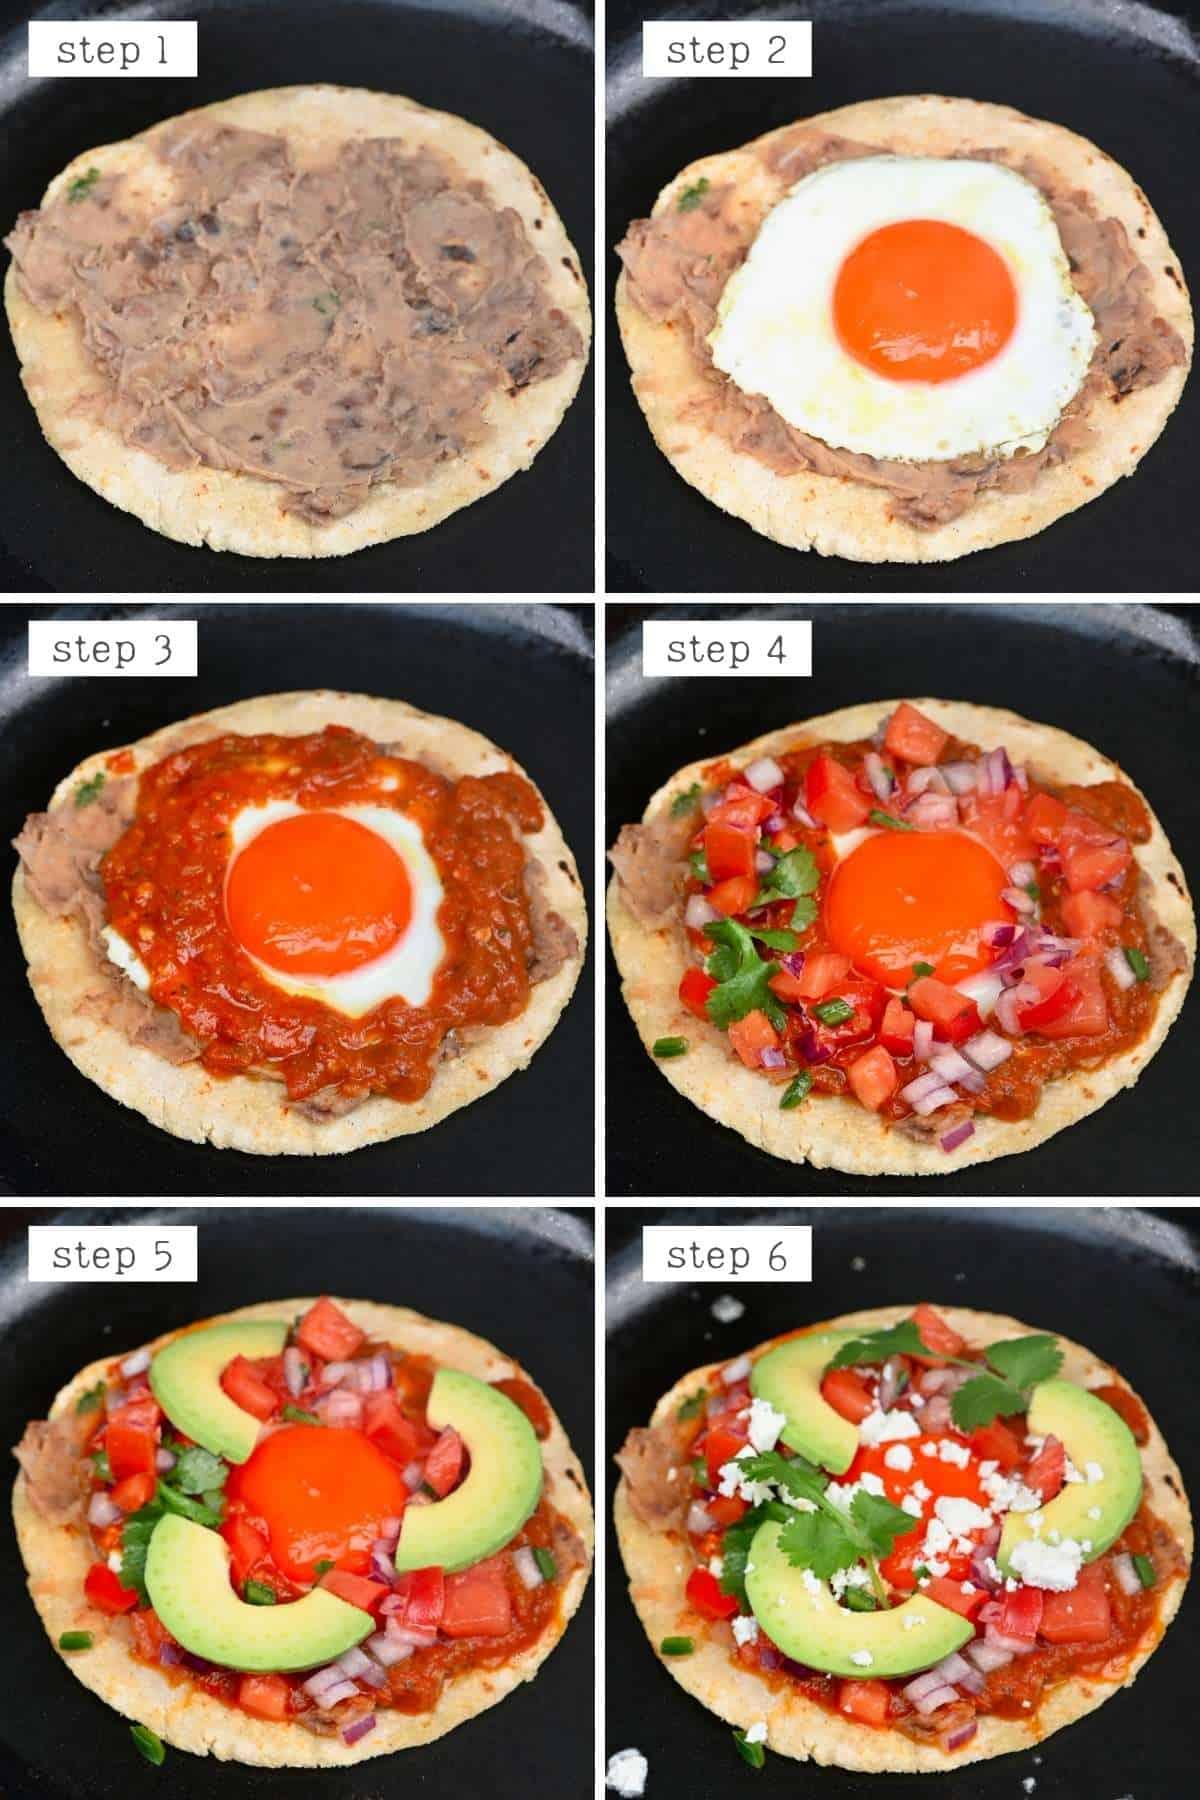 Steps for making huevos rancheros